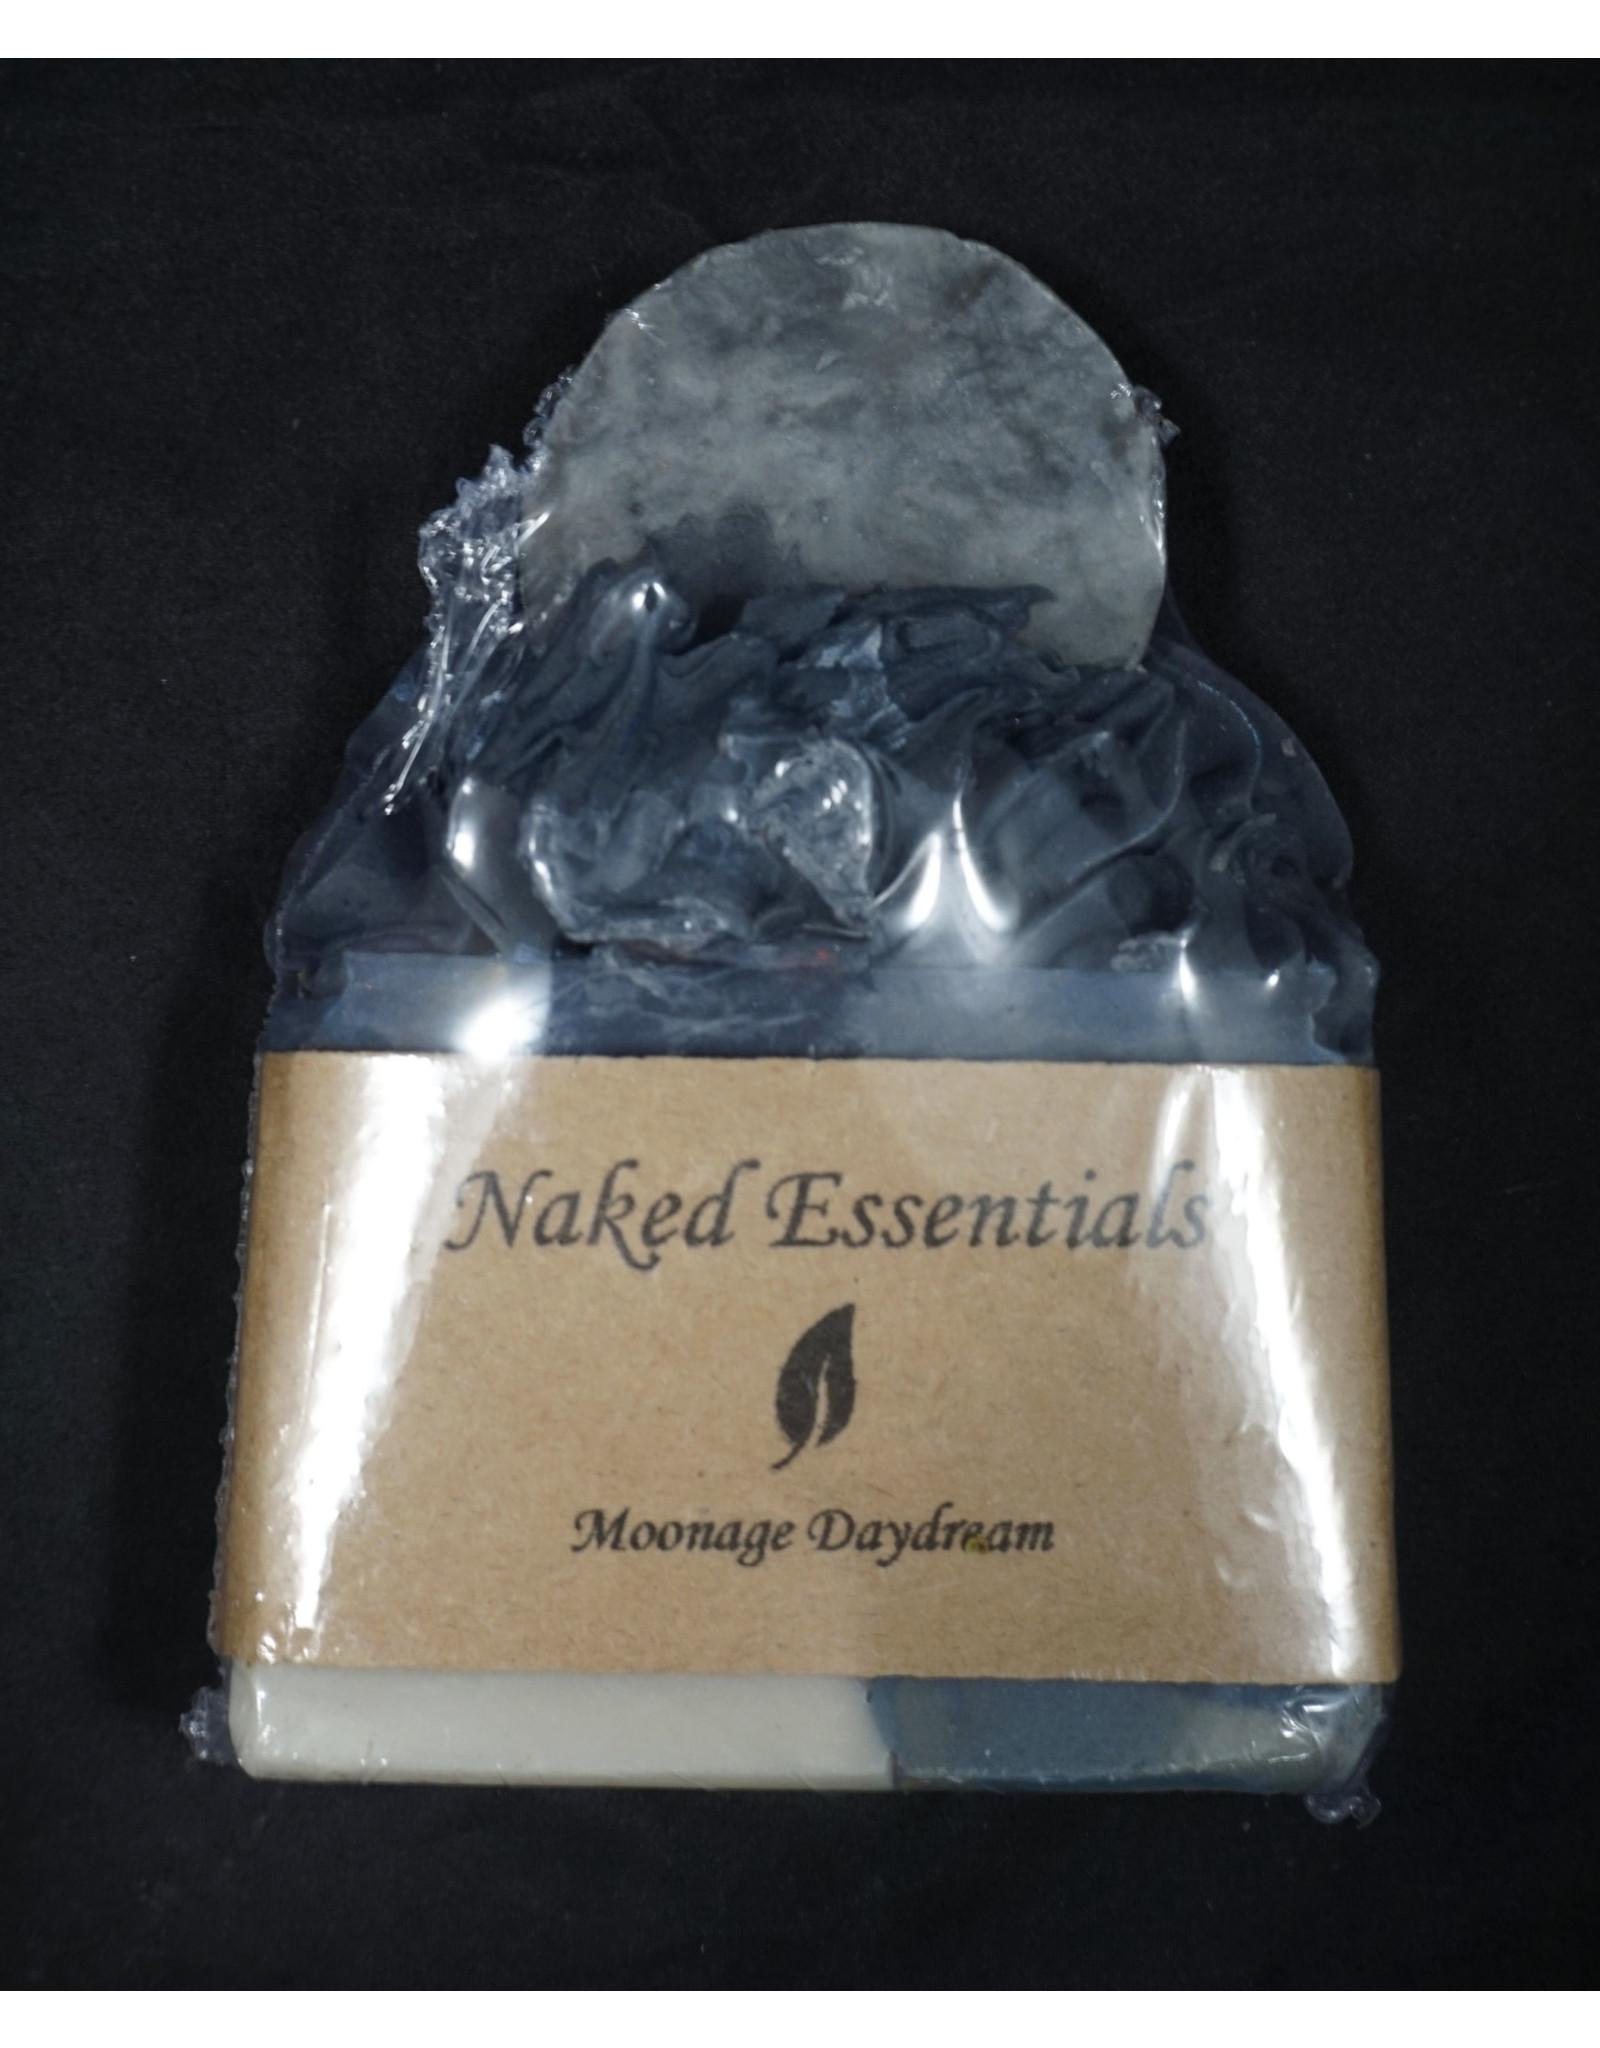 Naked Essentials Naked Essentials – Moonage Daydream